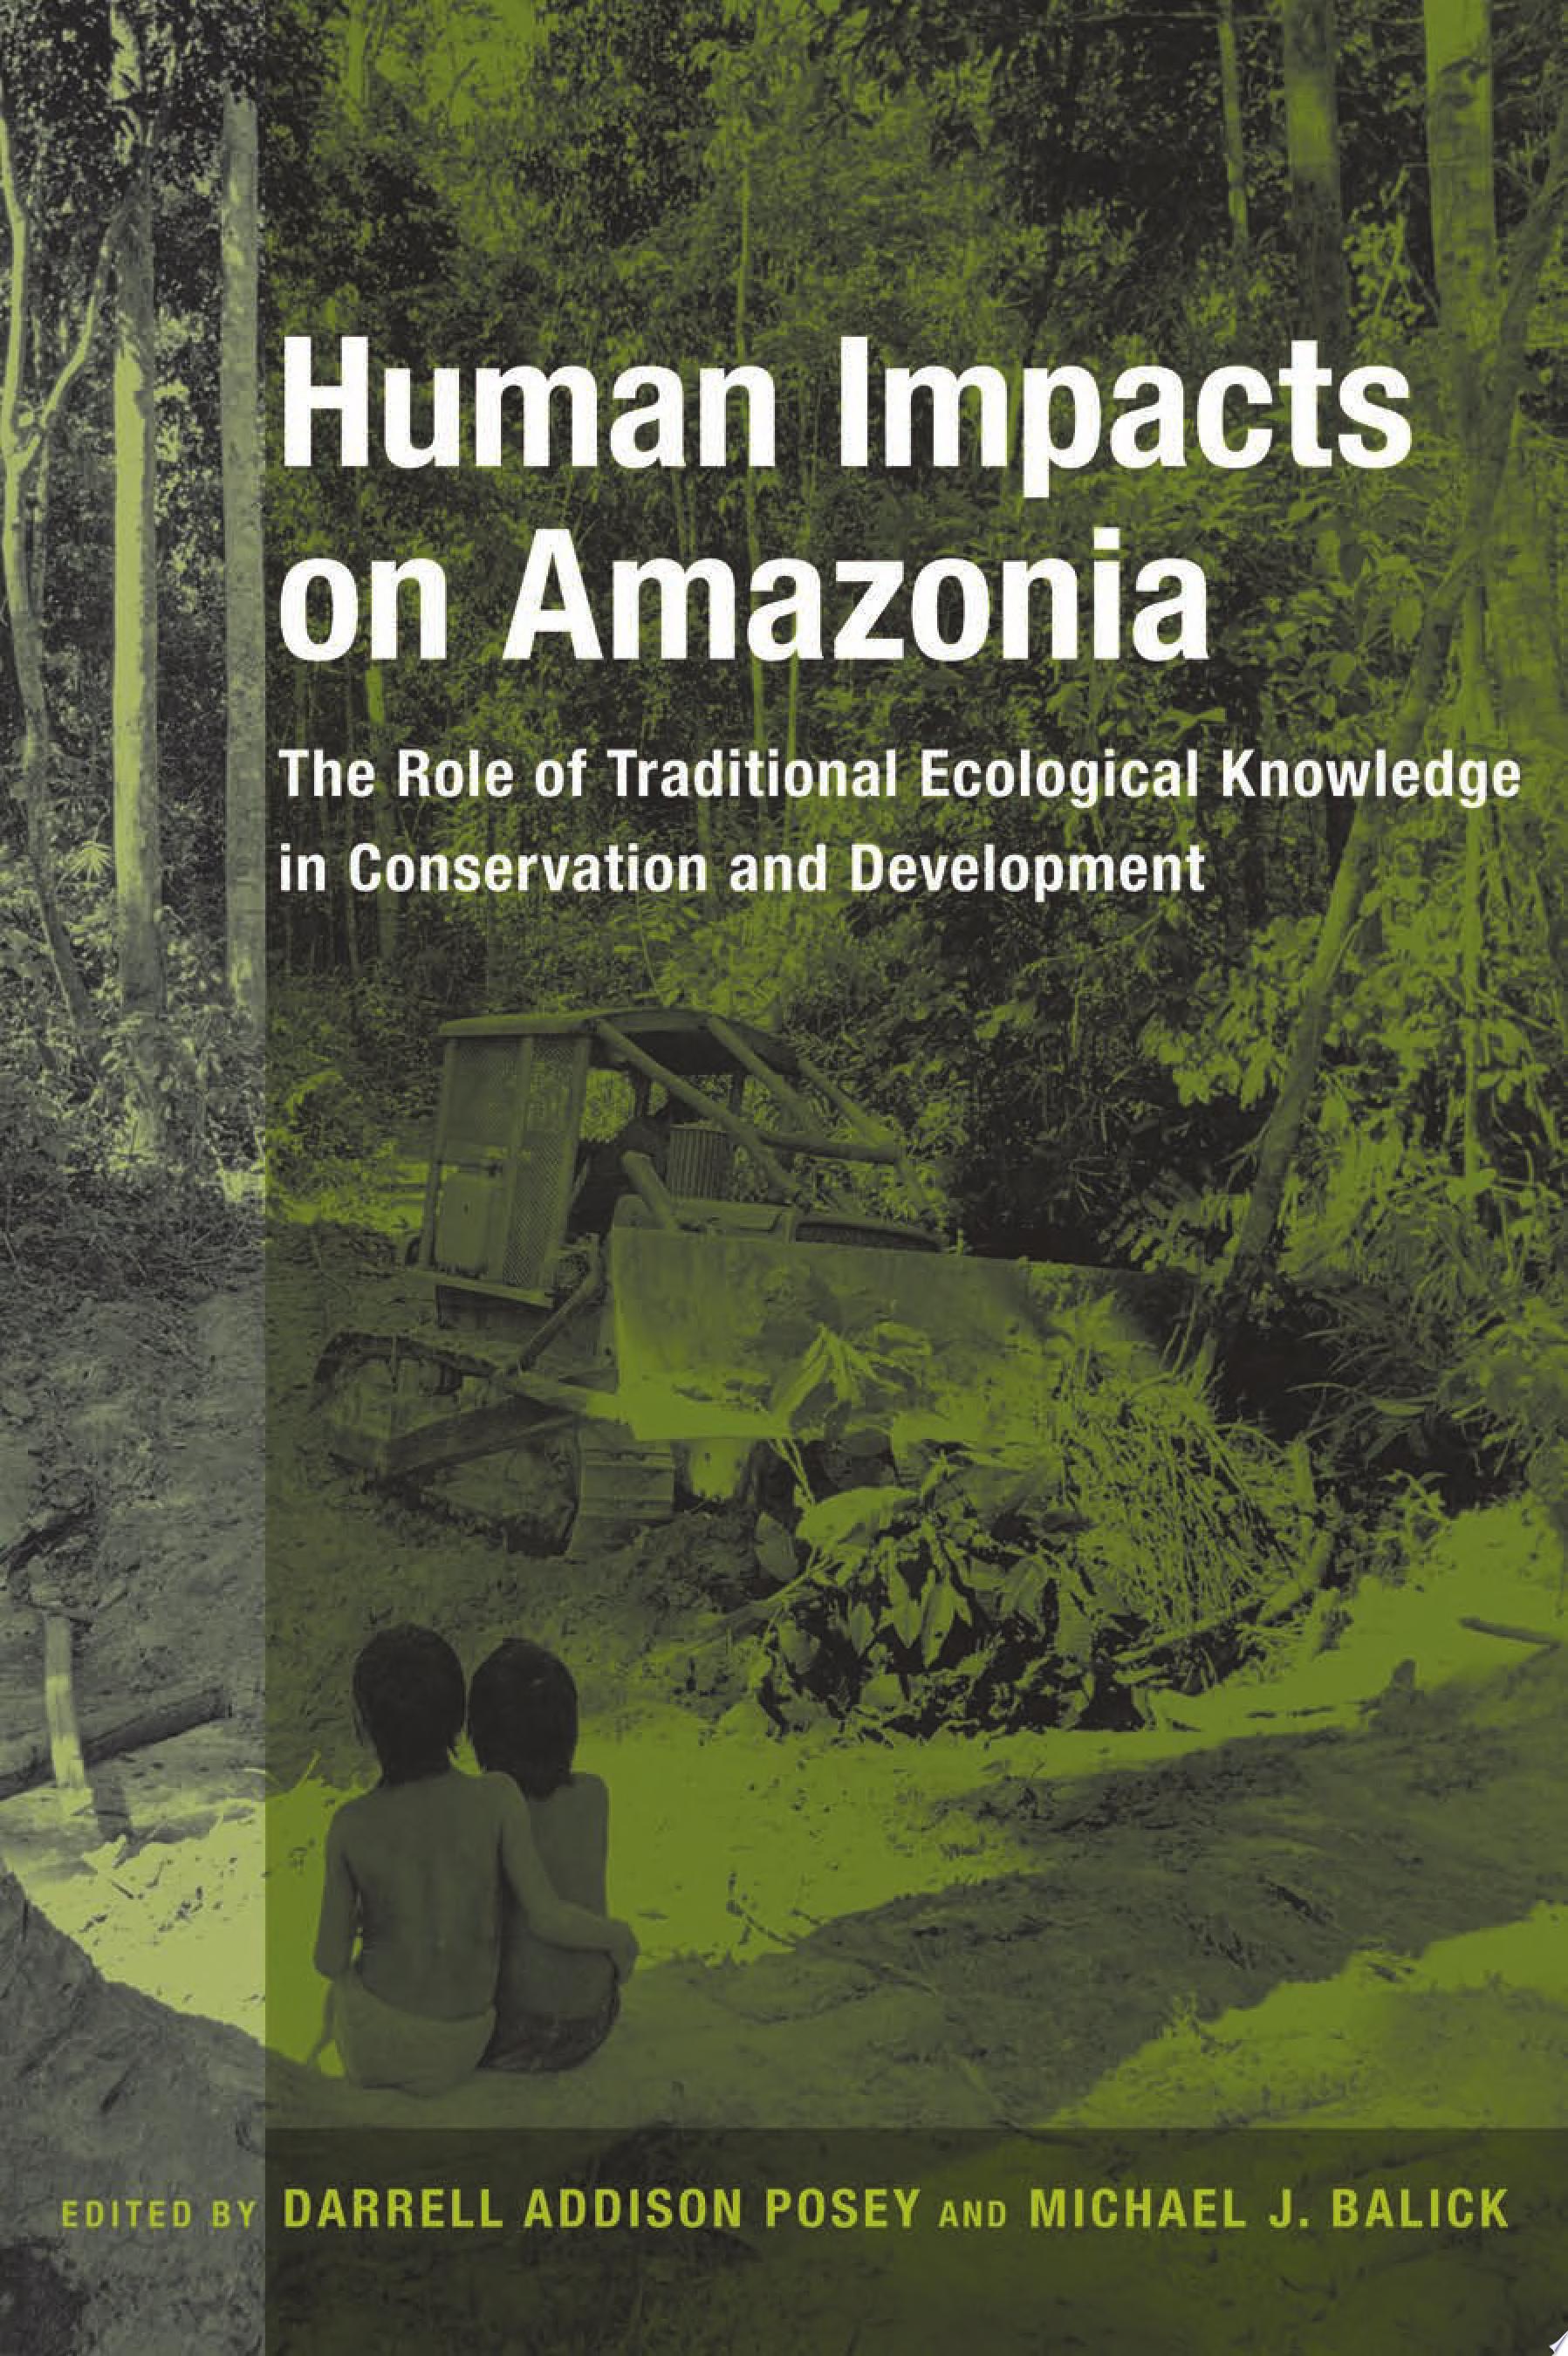 Human Impacts on Amazonia